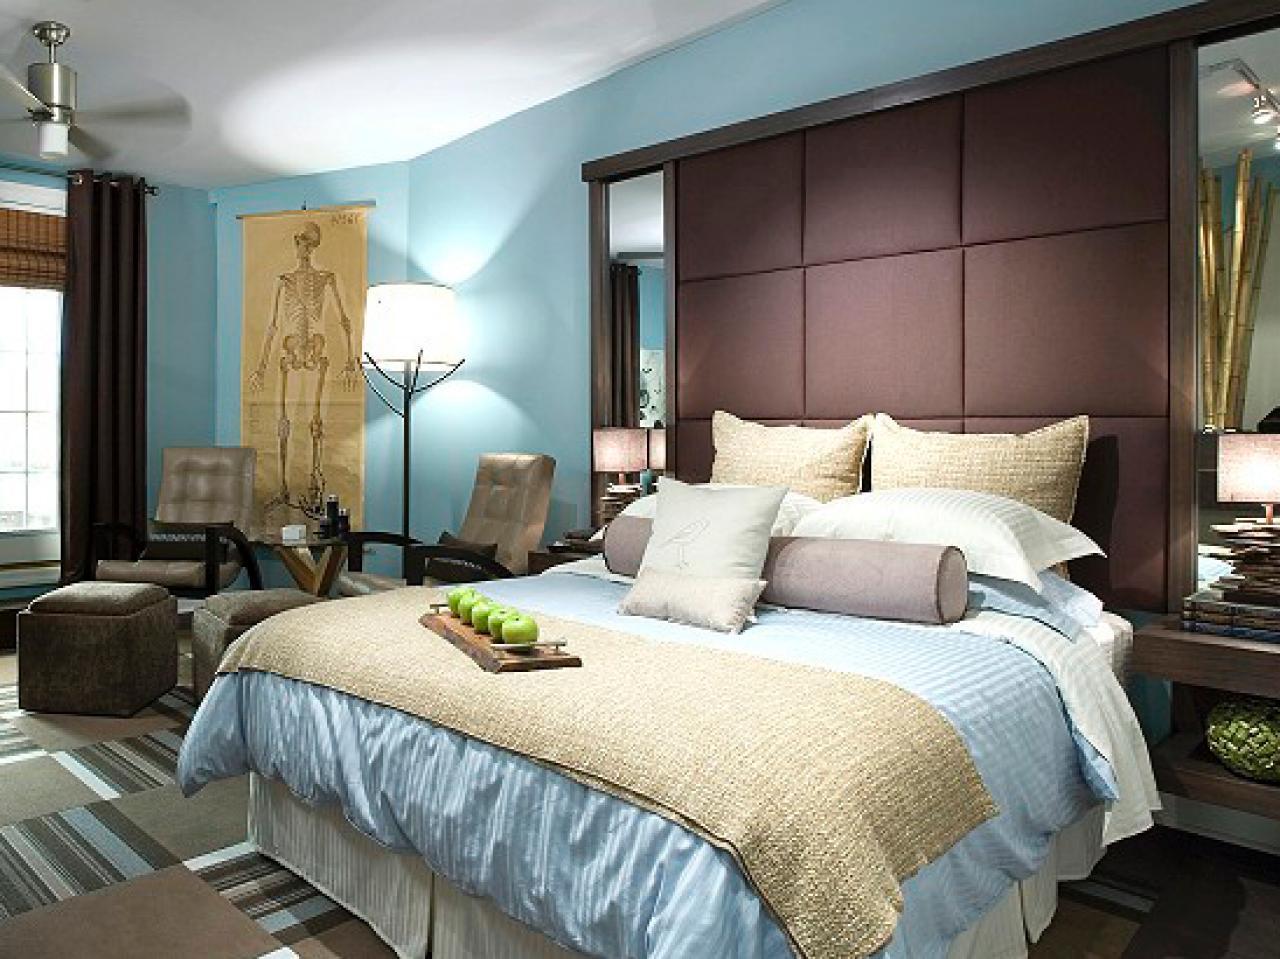 candice olson bedroom blue photo - 4